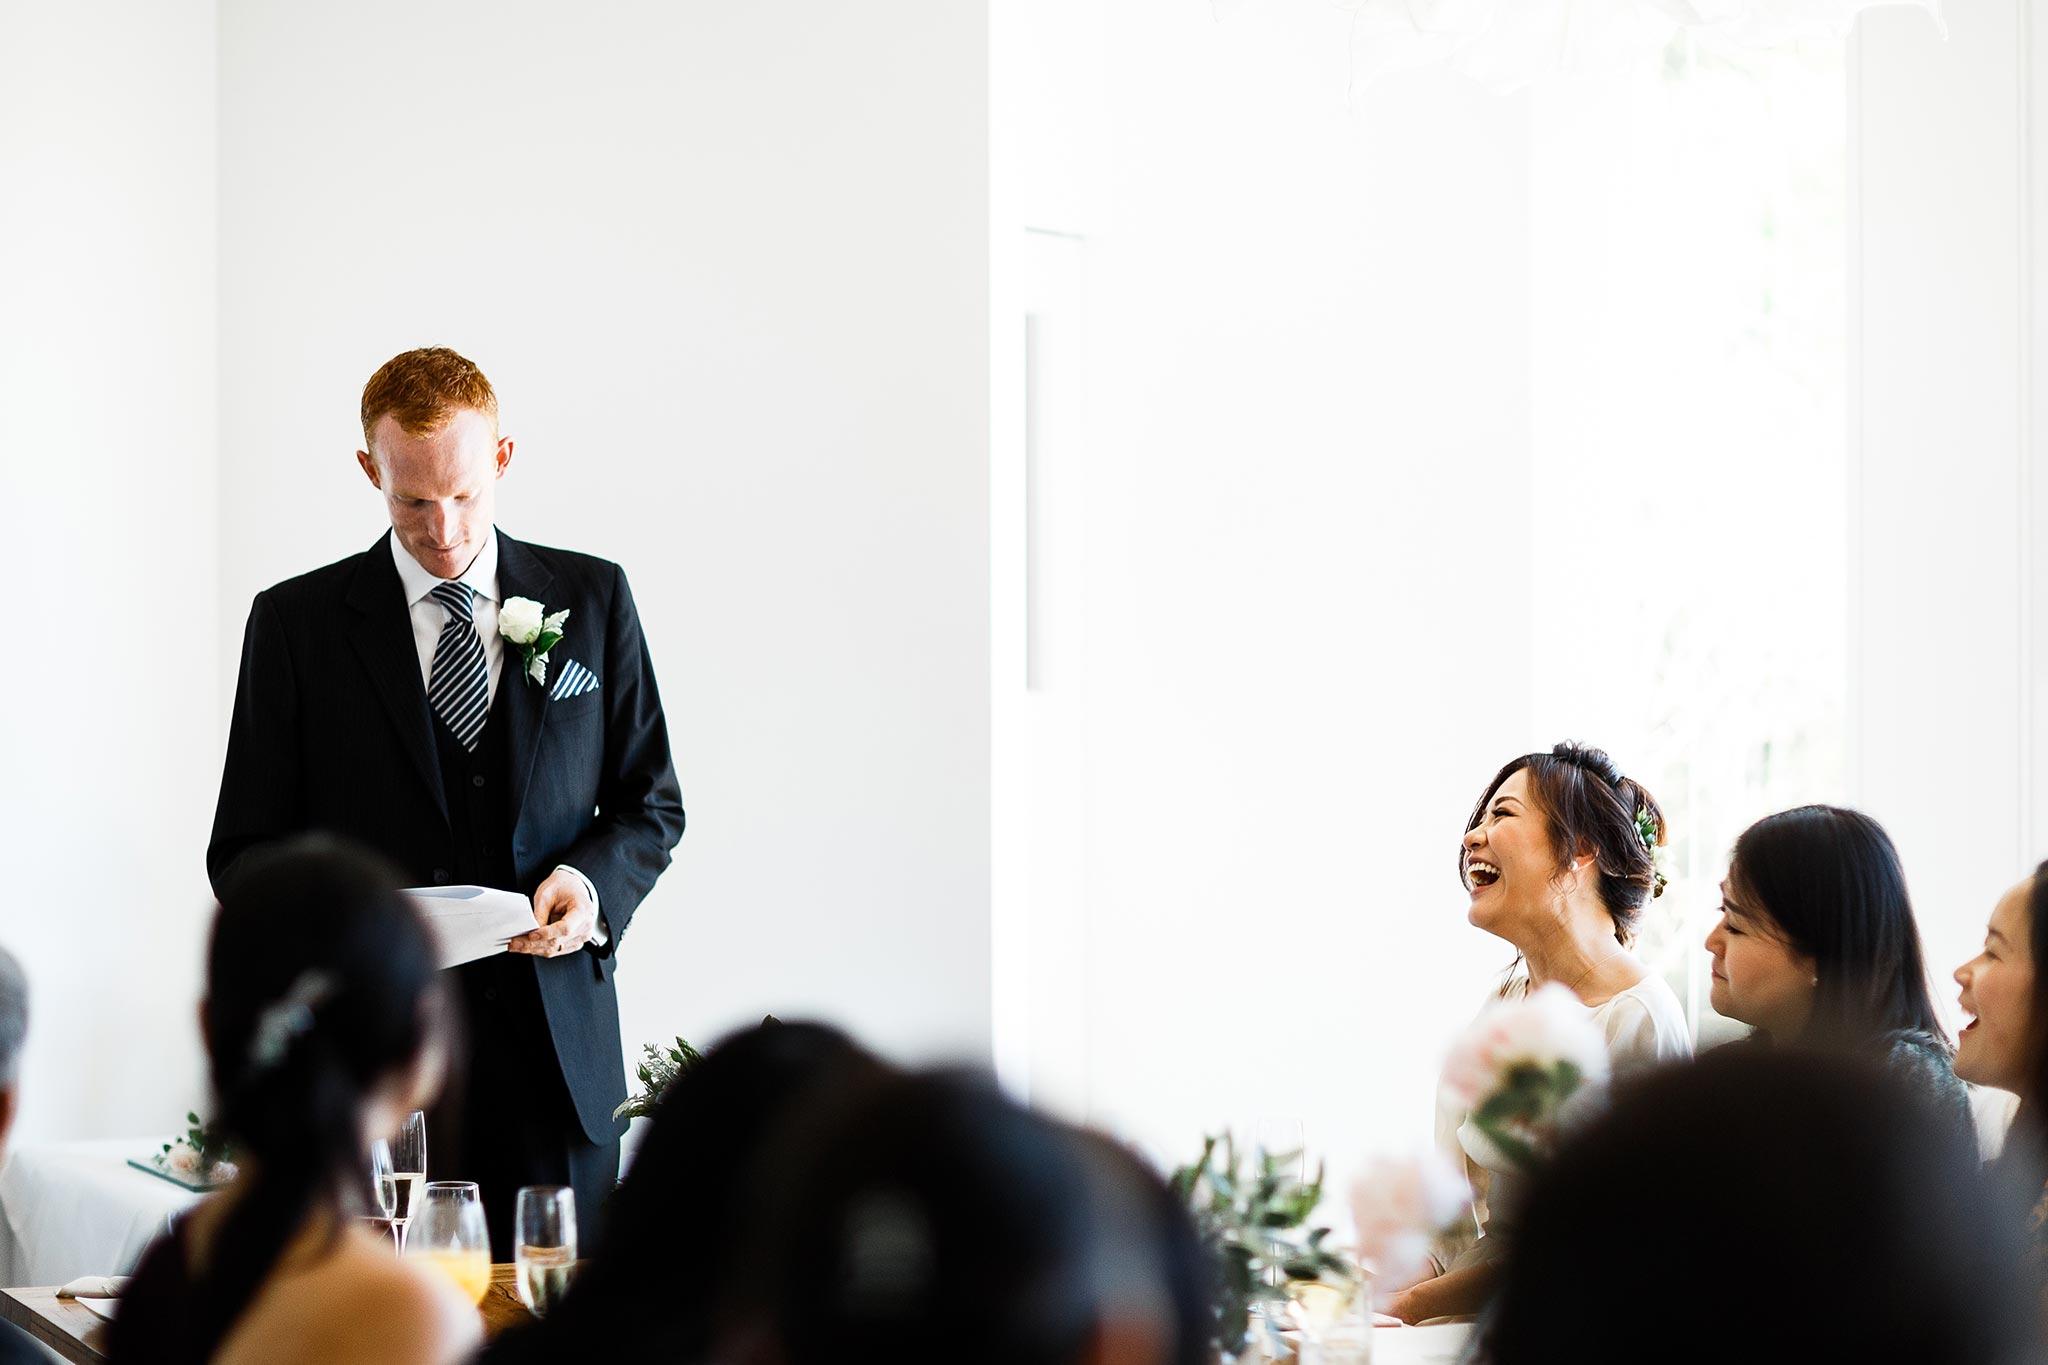 Daylesford-Lake-House-Wedding-Photographer-lunch-reception-speech